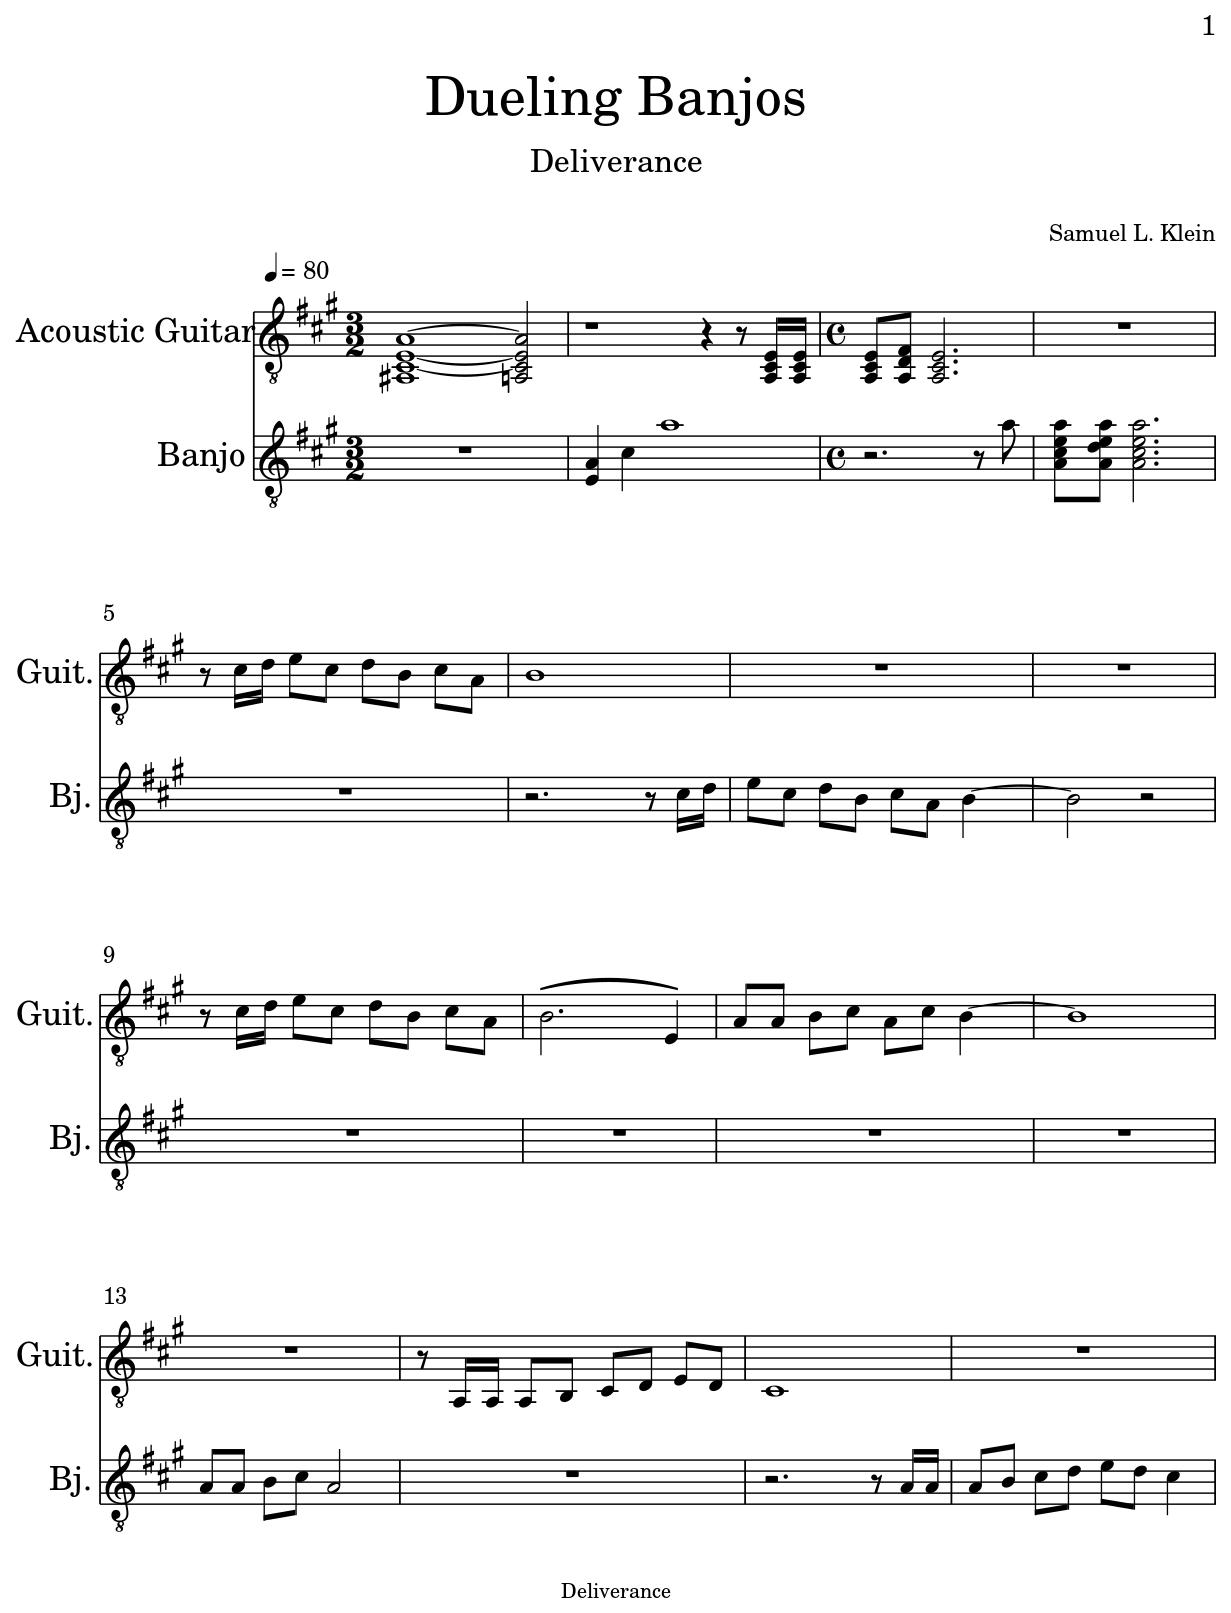 Dueling Banjos Sheet Music For Acoustic Guitar Banjo